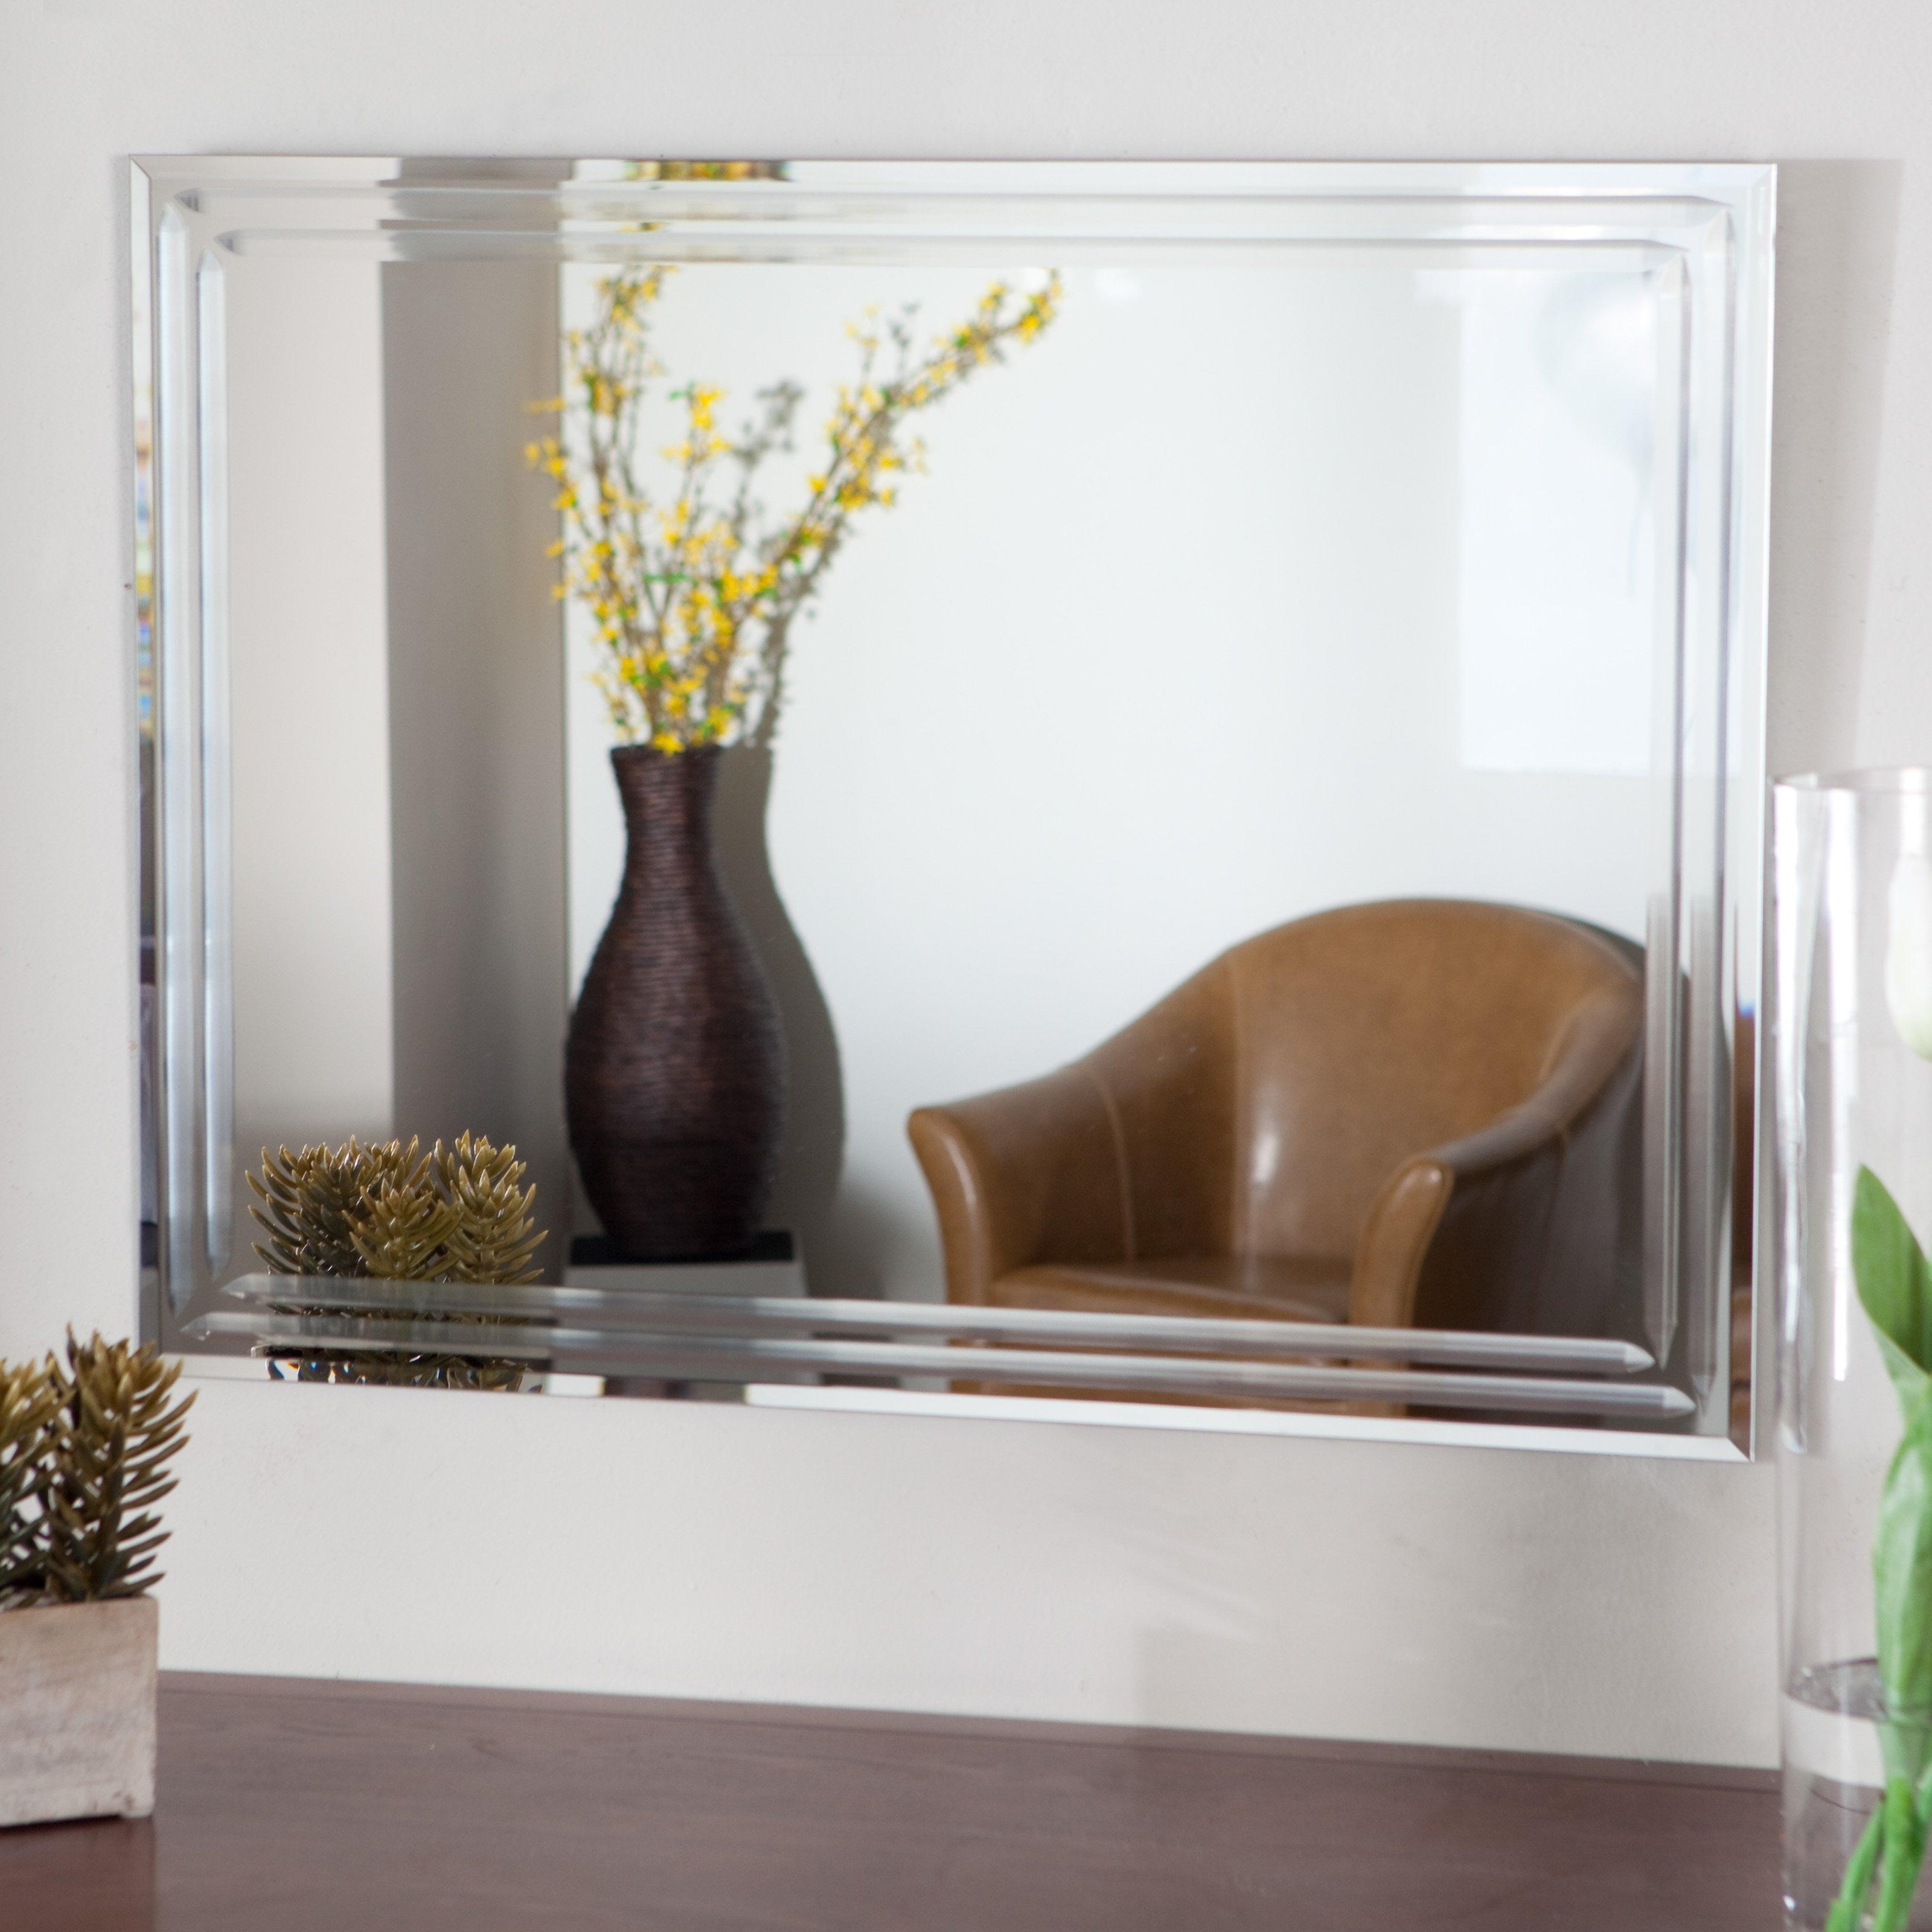 Beveled Wall Mirror Modern Beveled Wall Mirror Modern dcor wonderland frameless tri bevel wall mirror 235w x 315h 3200 X 3200